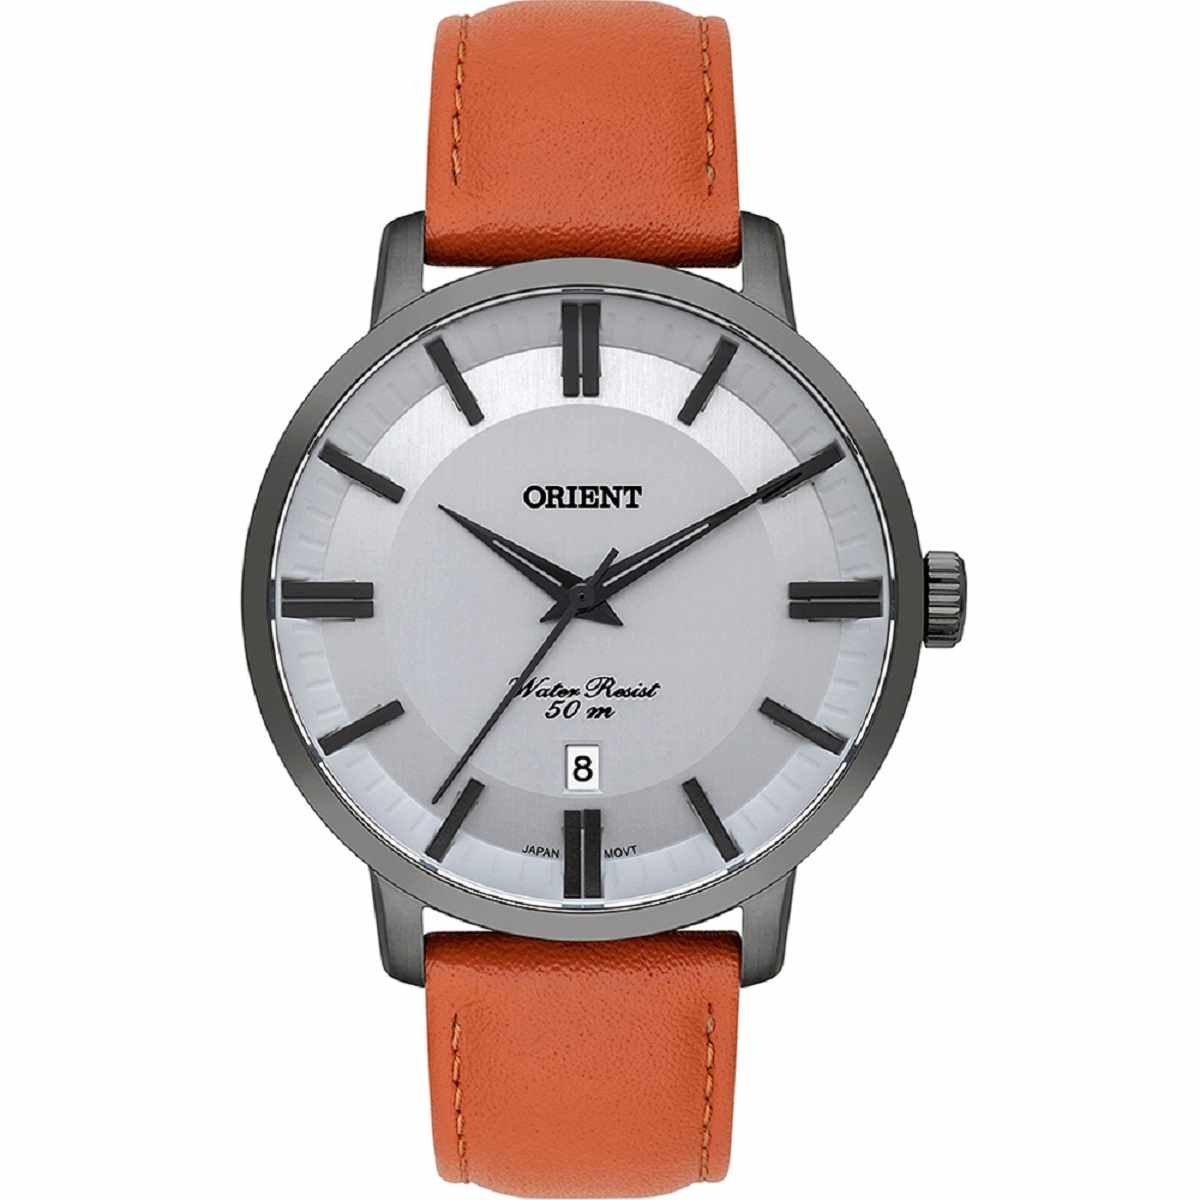 Relógio Orient Masculino Pulseira de Couro Laranja MYSC1005 S1MX